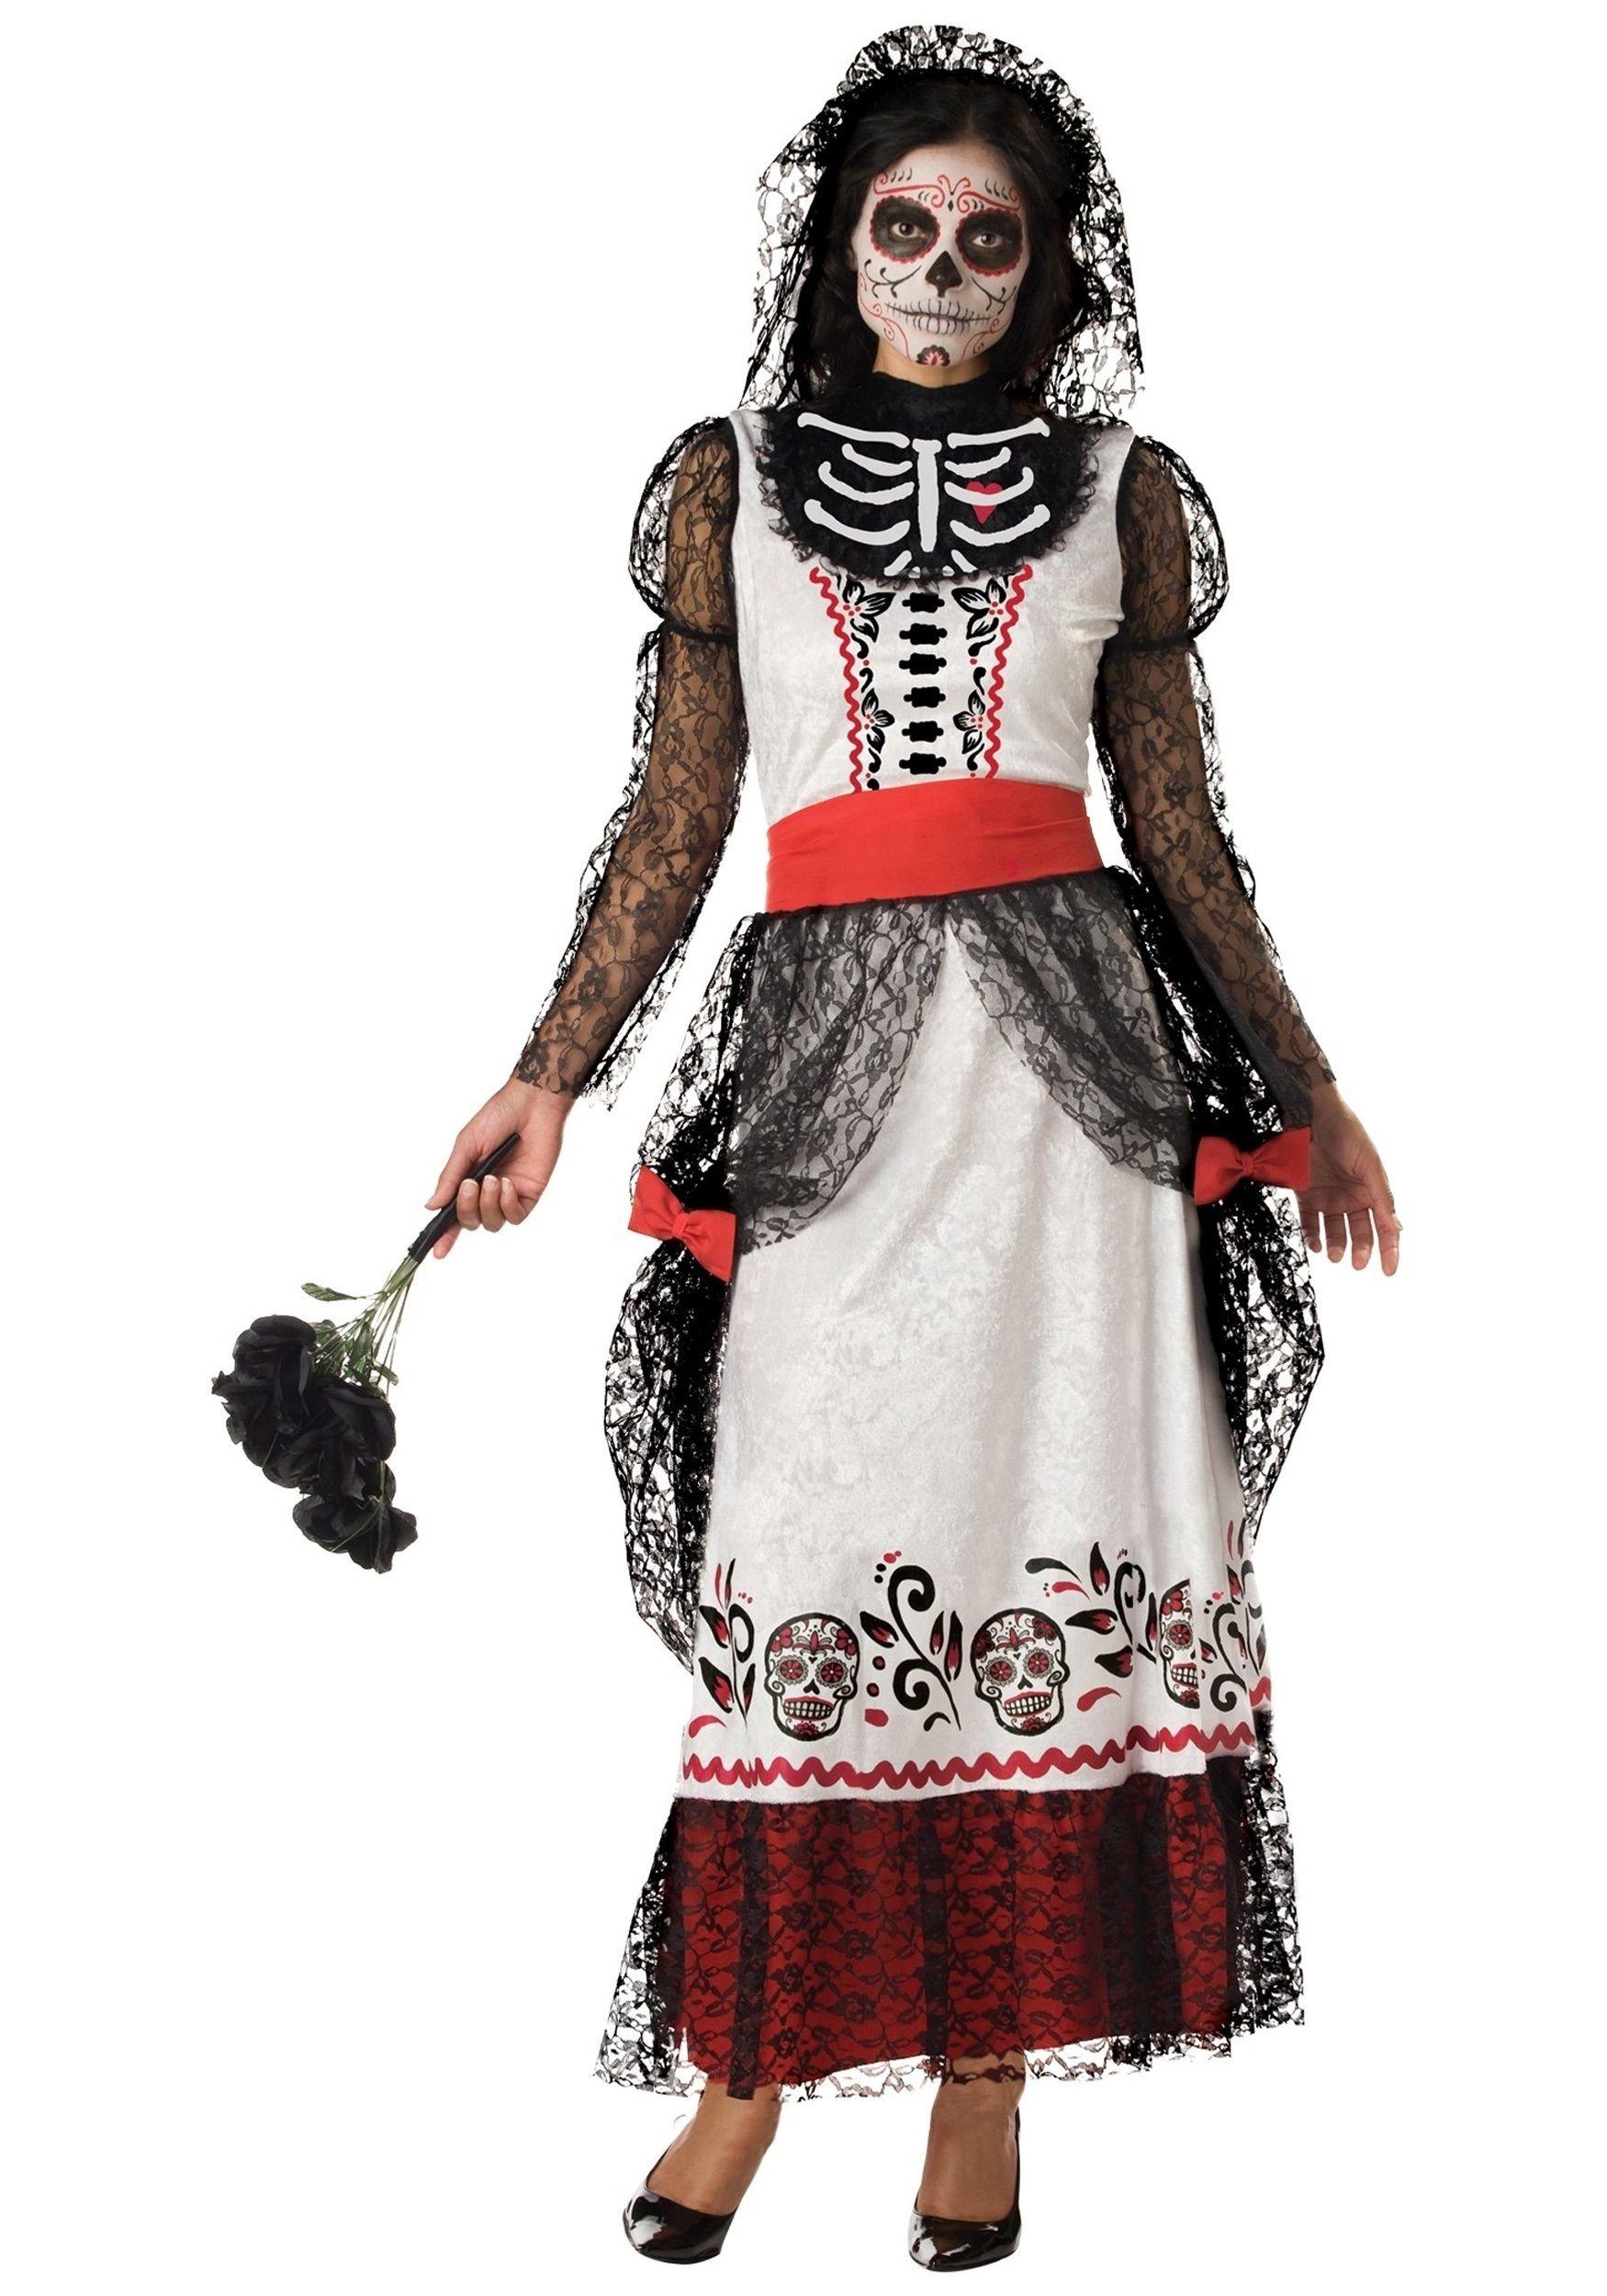 10 Best Dia De Los Muertos Costume Ideas dia de los muertos costumes costume ideas goth costumes womens 2020